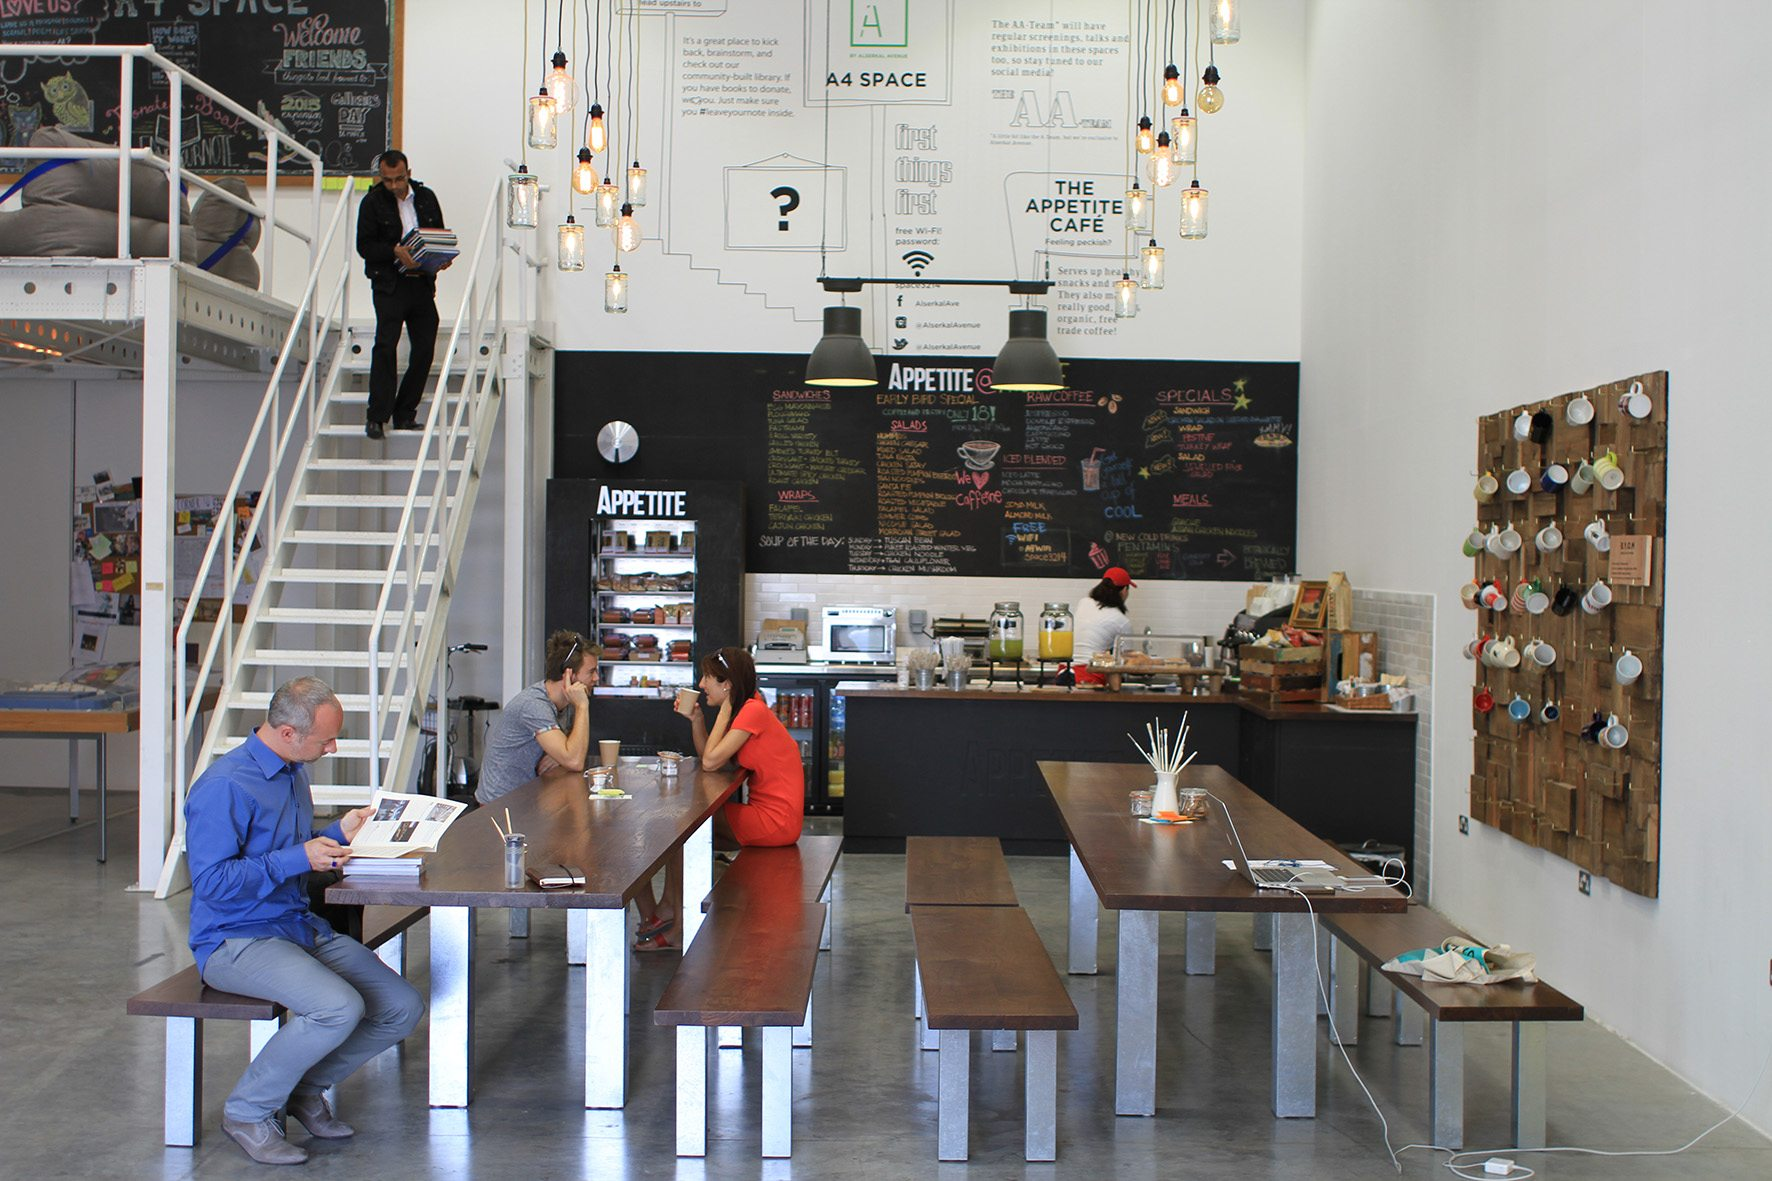 Appetite Café. Das Café ist Lokal, Bibliothek und Arbeitsplatz im A4 Space.